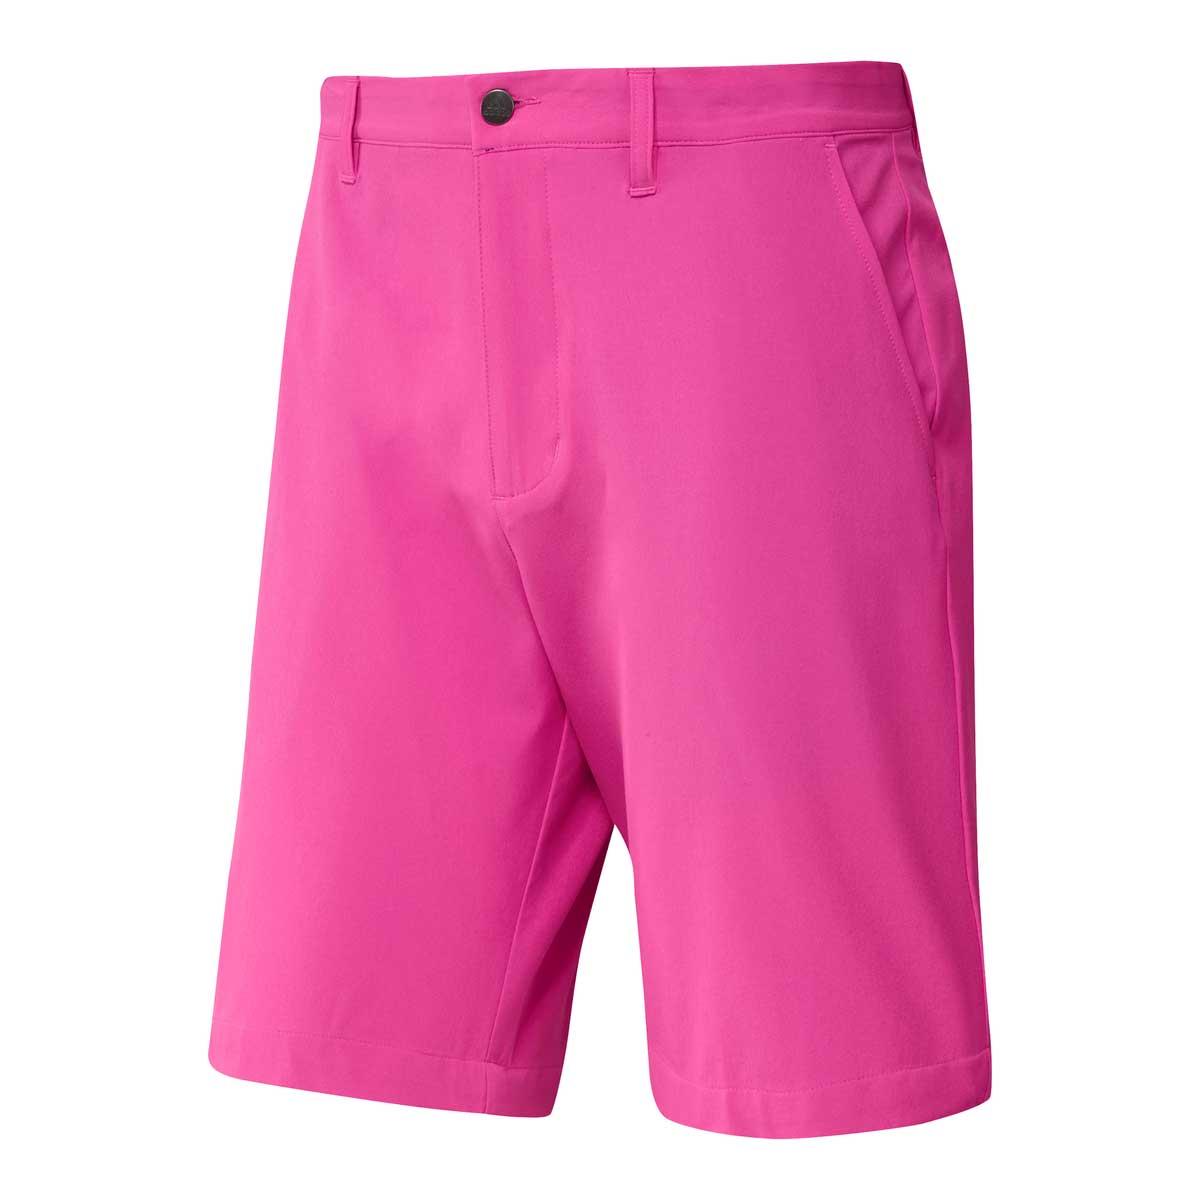 Adidas Men's Ultimate 365 Screaming Pink Short